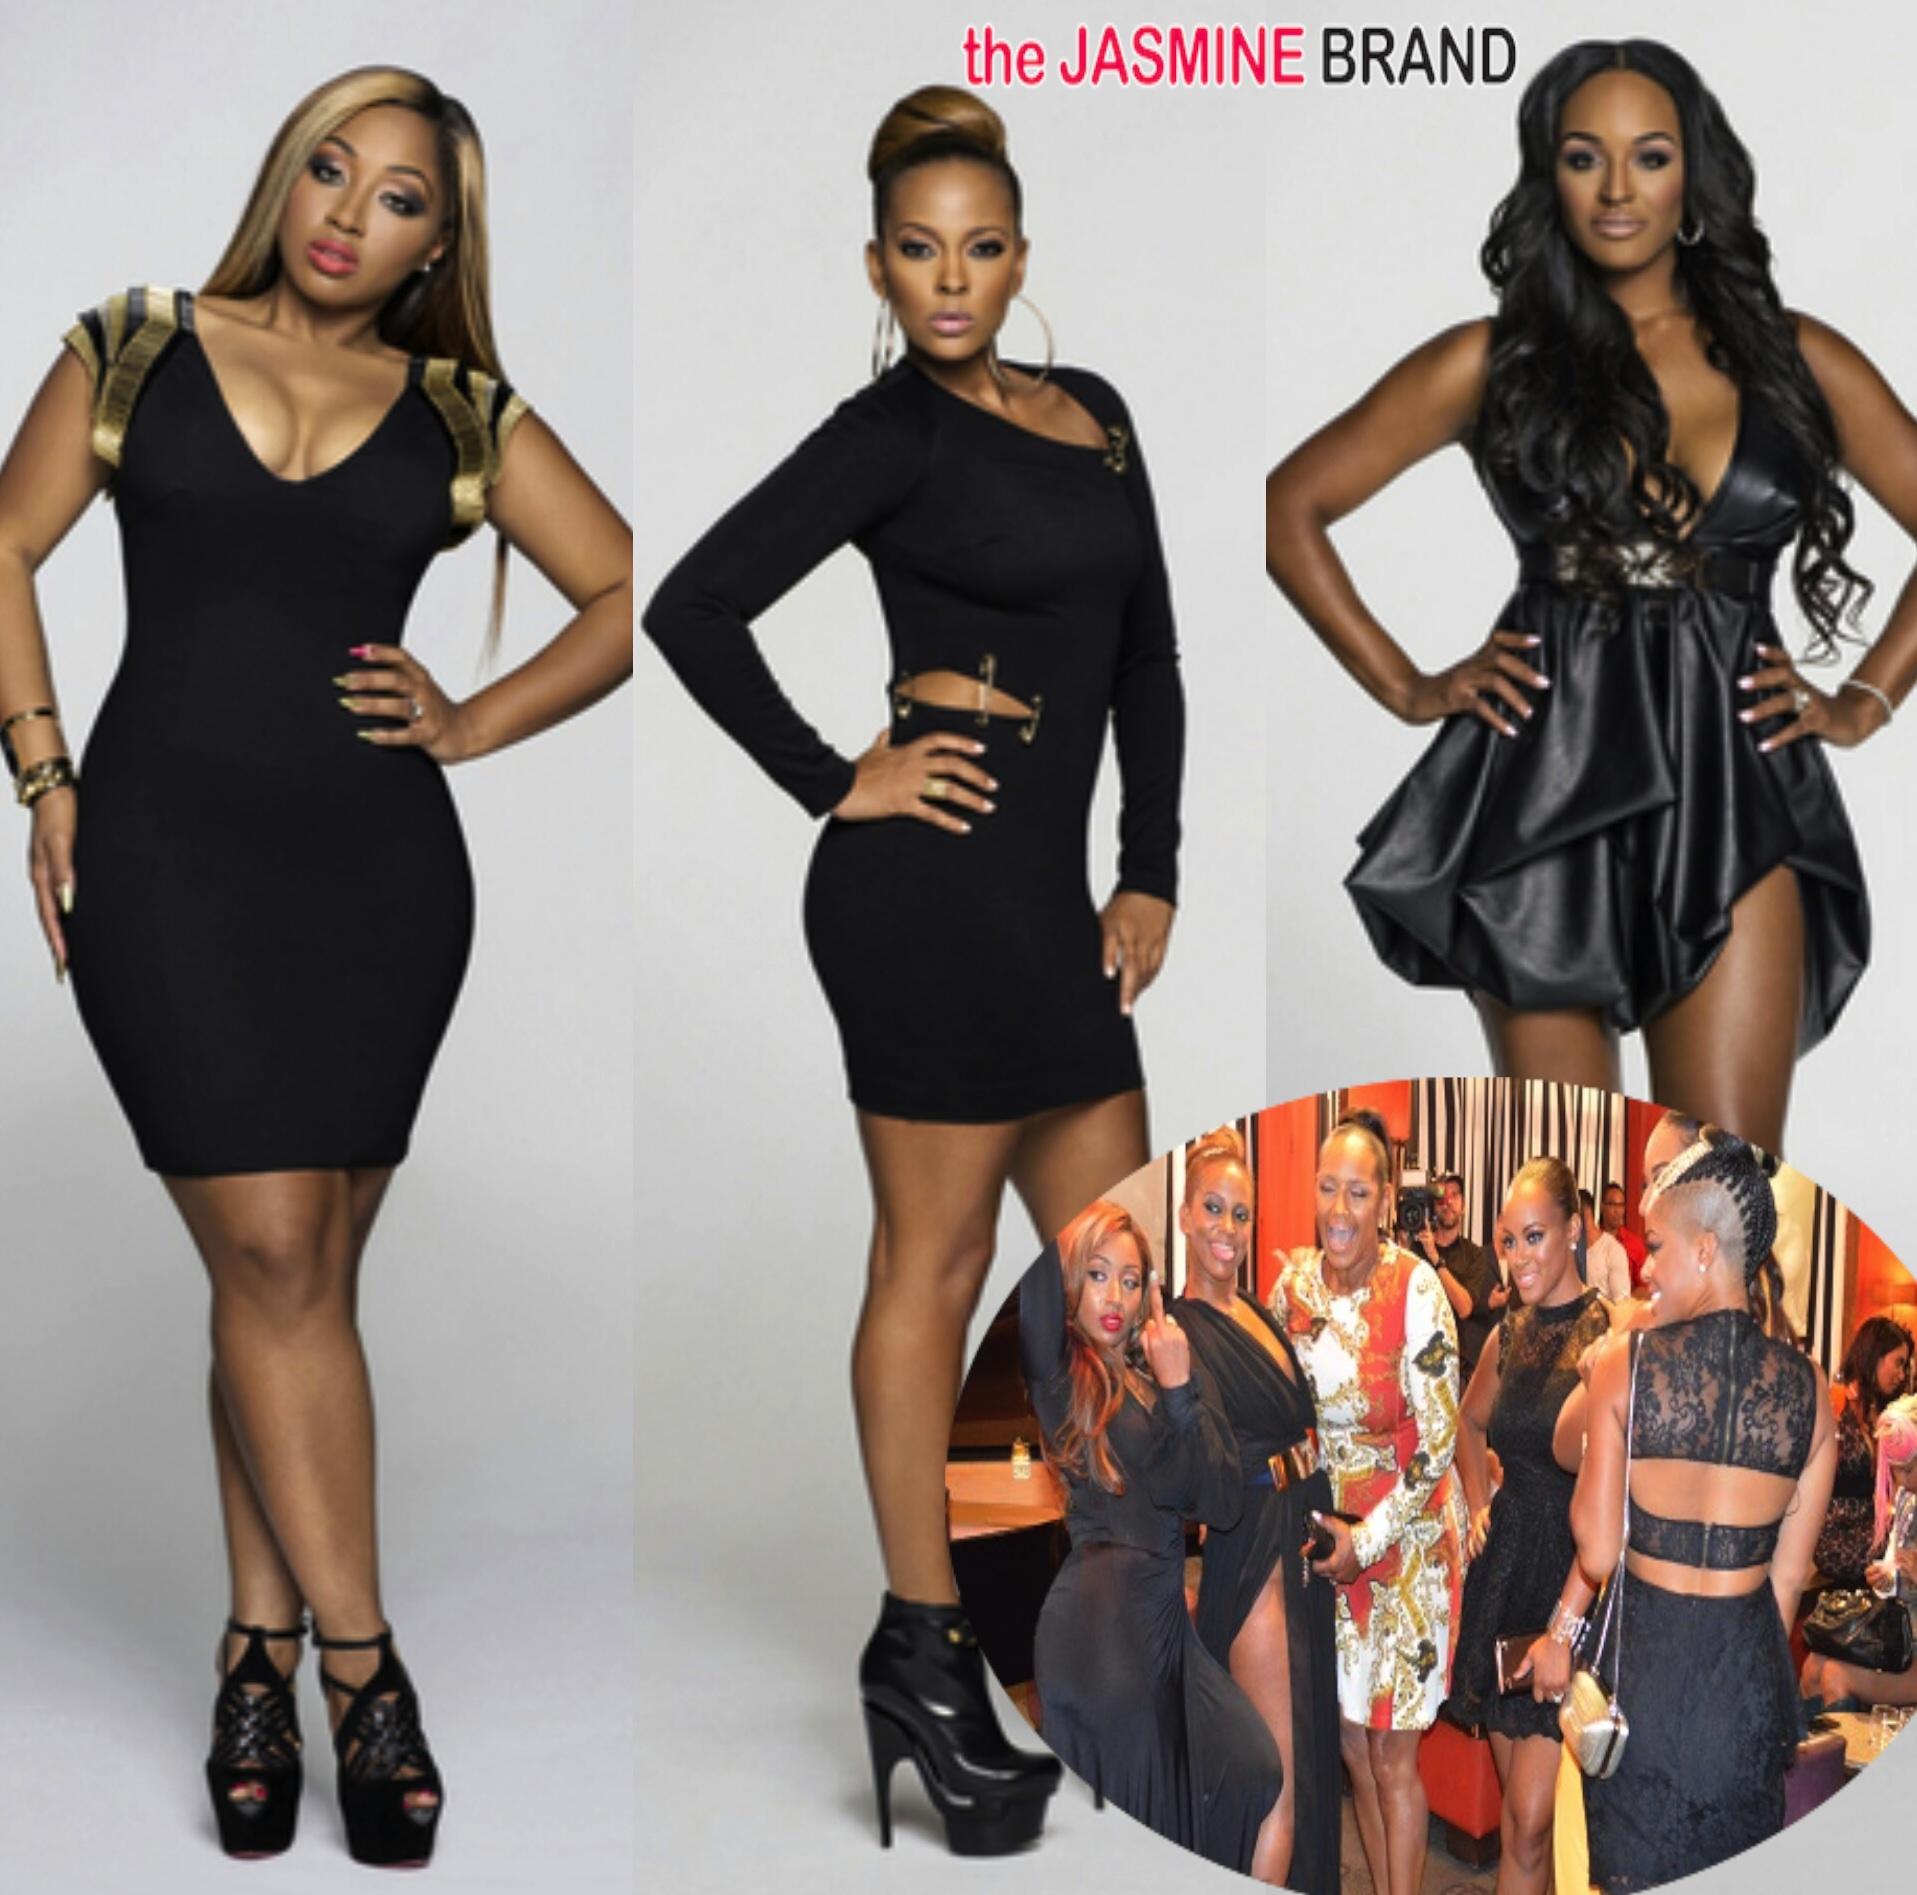 Meet Basketball Wives La S New Cast Members Sundy Carter Brittish Williams And Brandi Maxiell Thejasminebrand